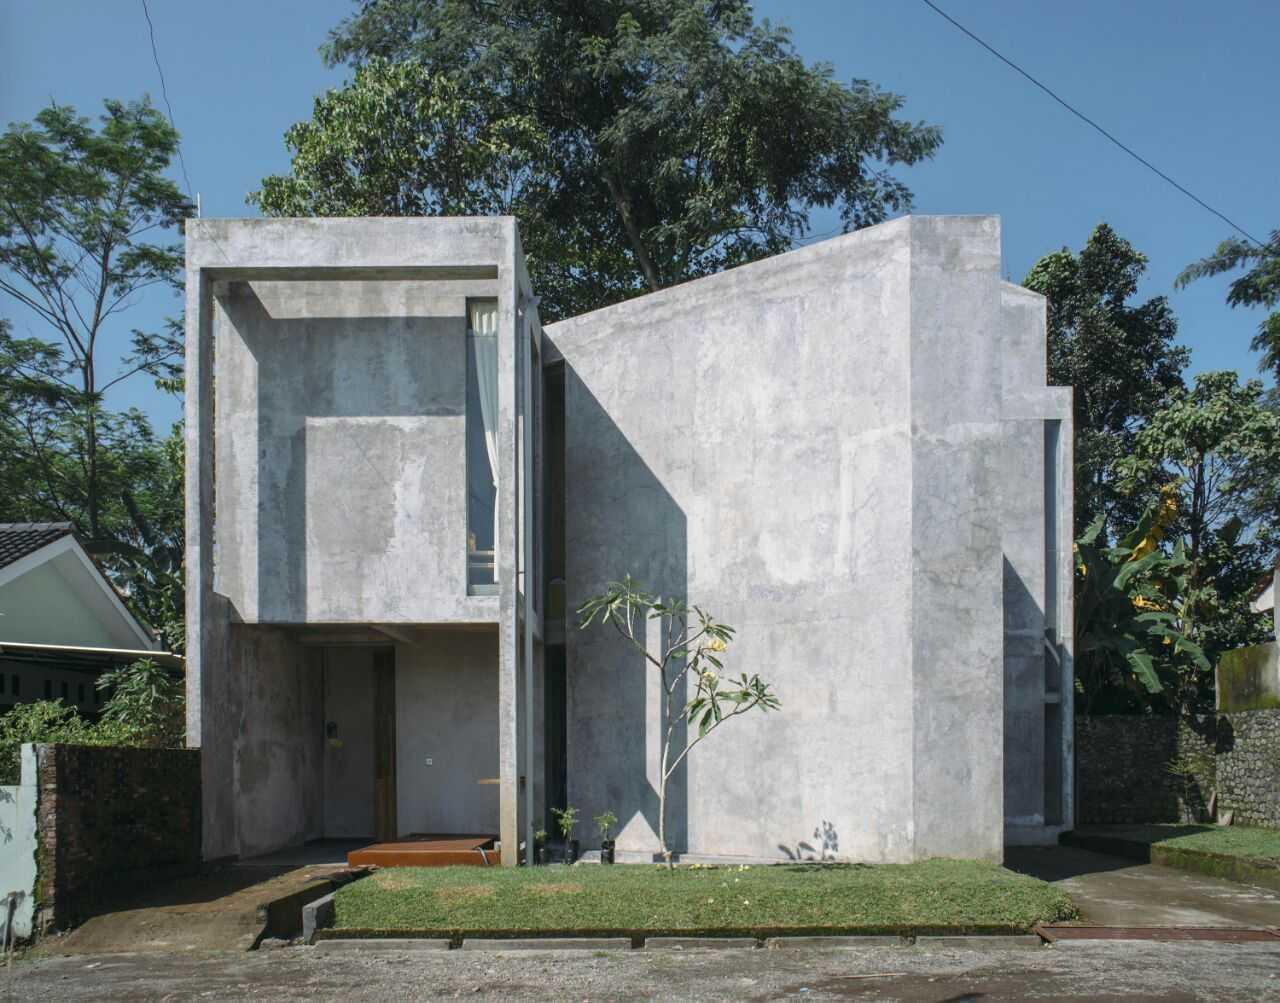 Jasa Arsitek Akbar Hantar di Banyumas